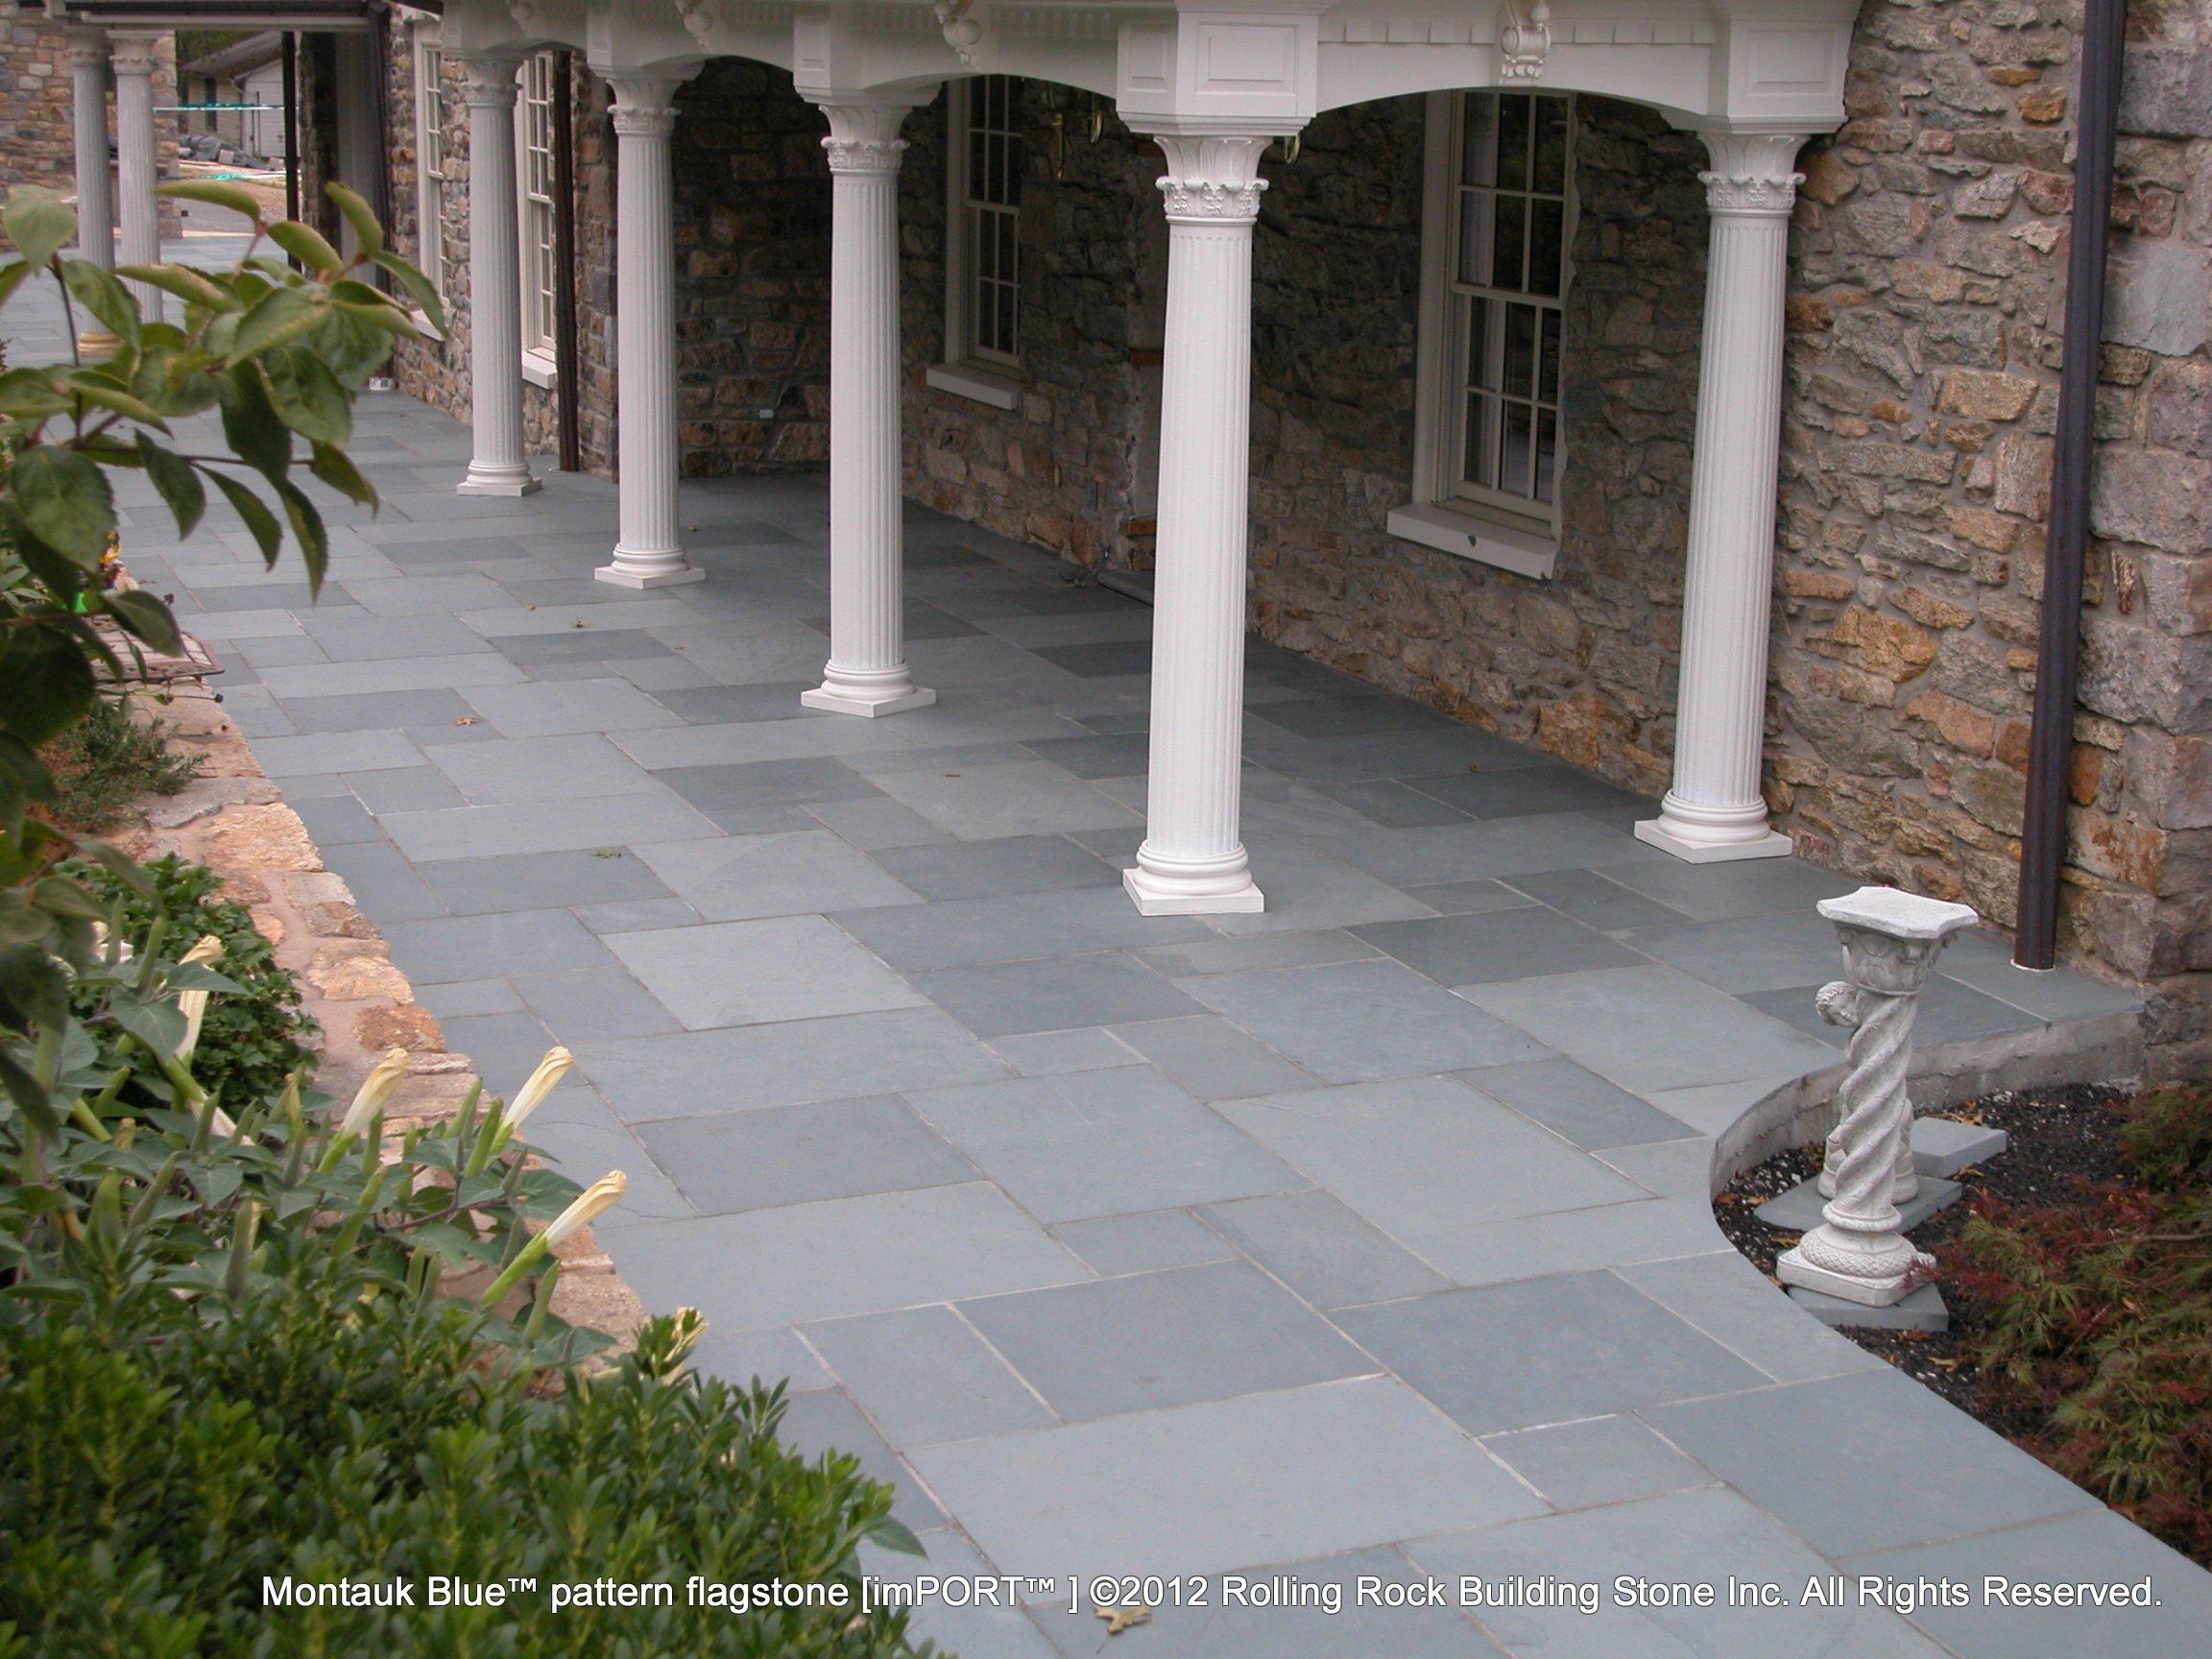 Montauk Blue Pattern Flagstone | Rolling Rock Building Stone